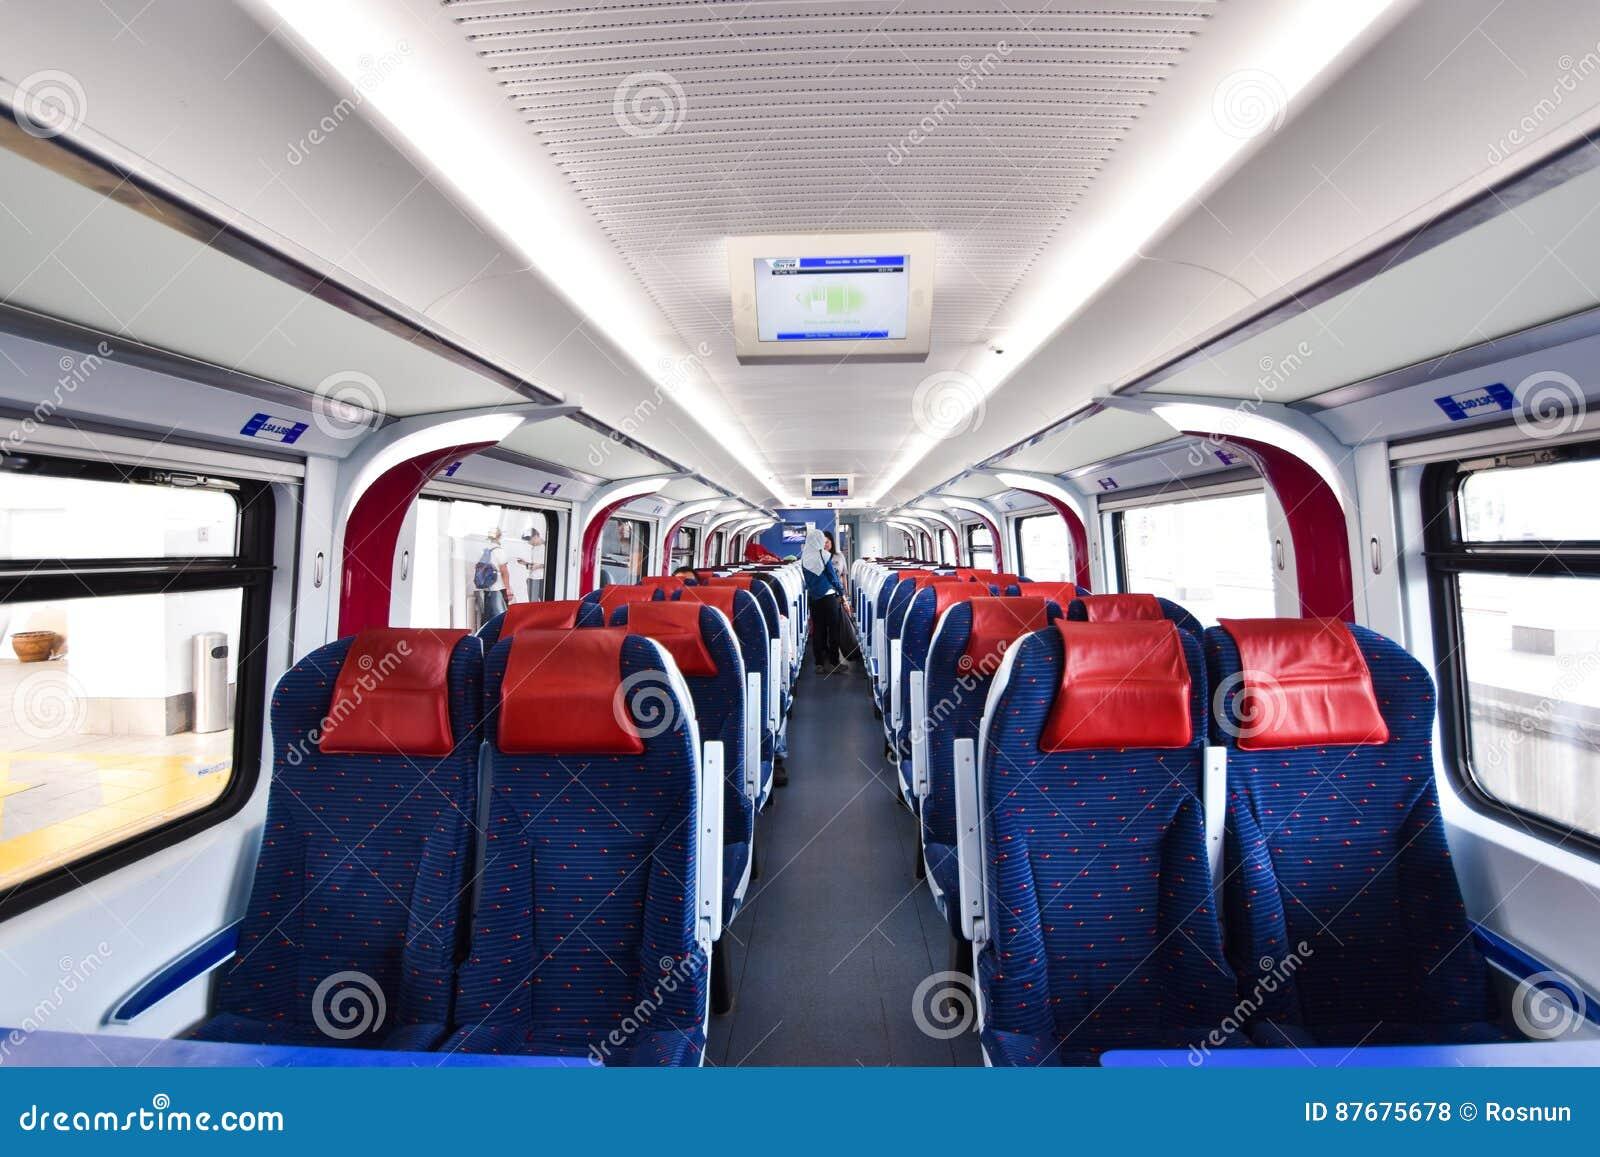 inside ets train inter city rail service in malaysia editorial